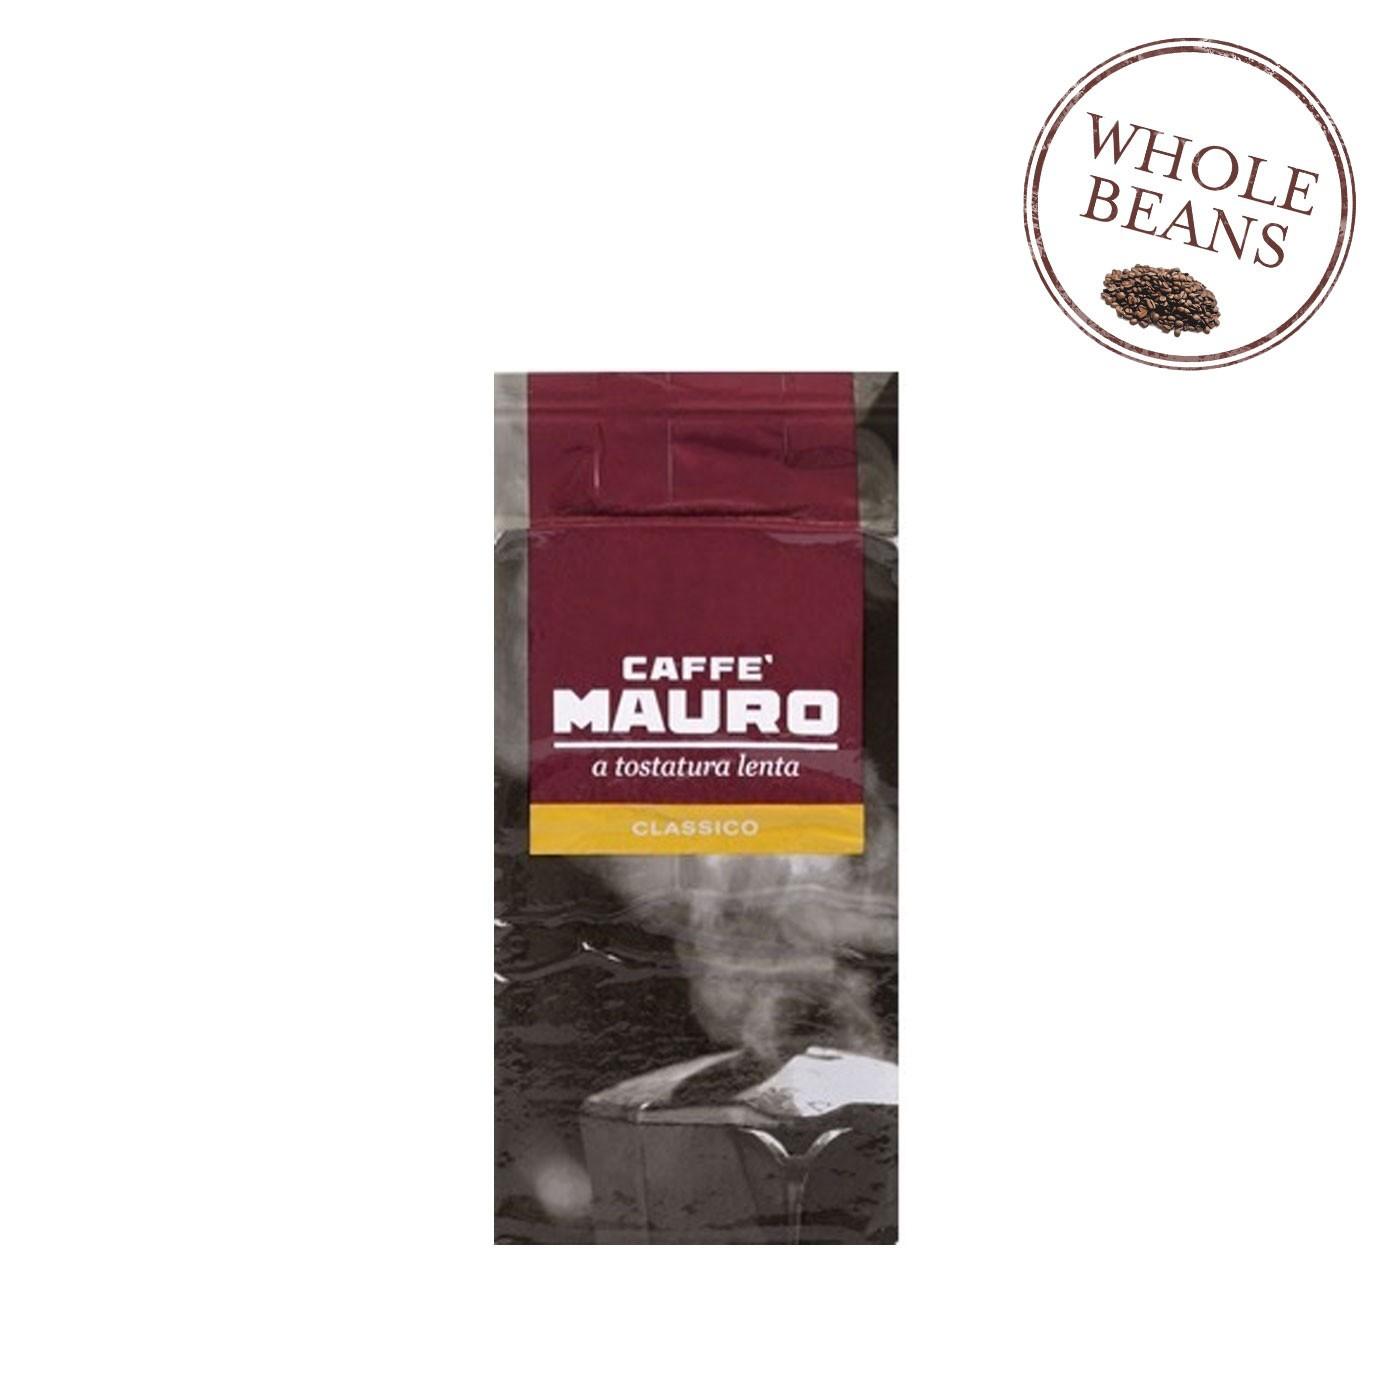 Classic Espresso Coffee 8.8 oz